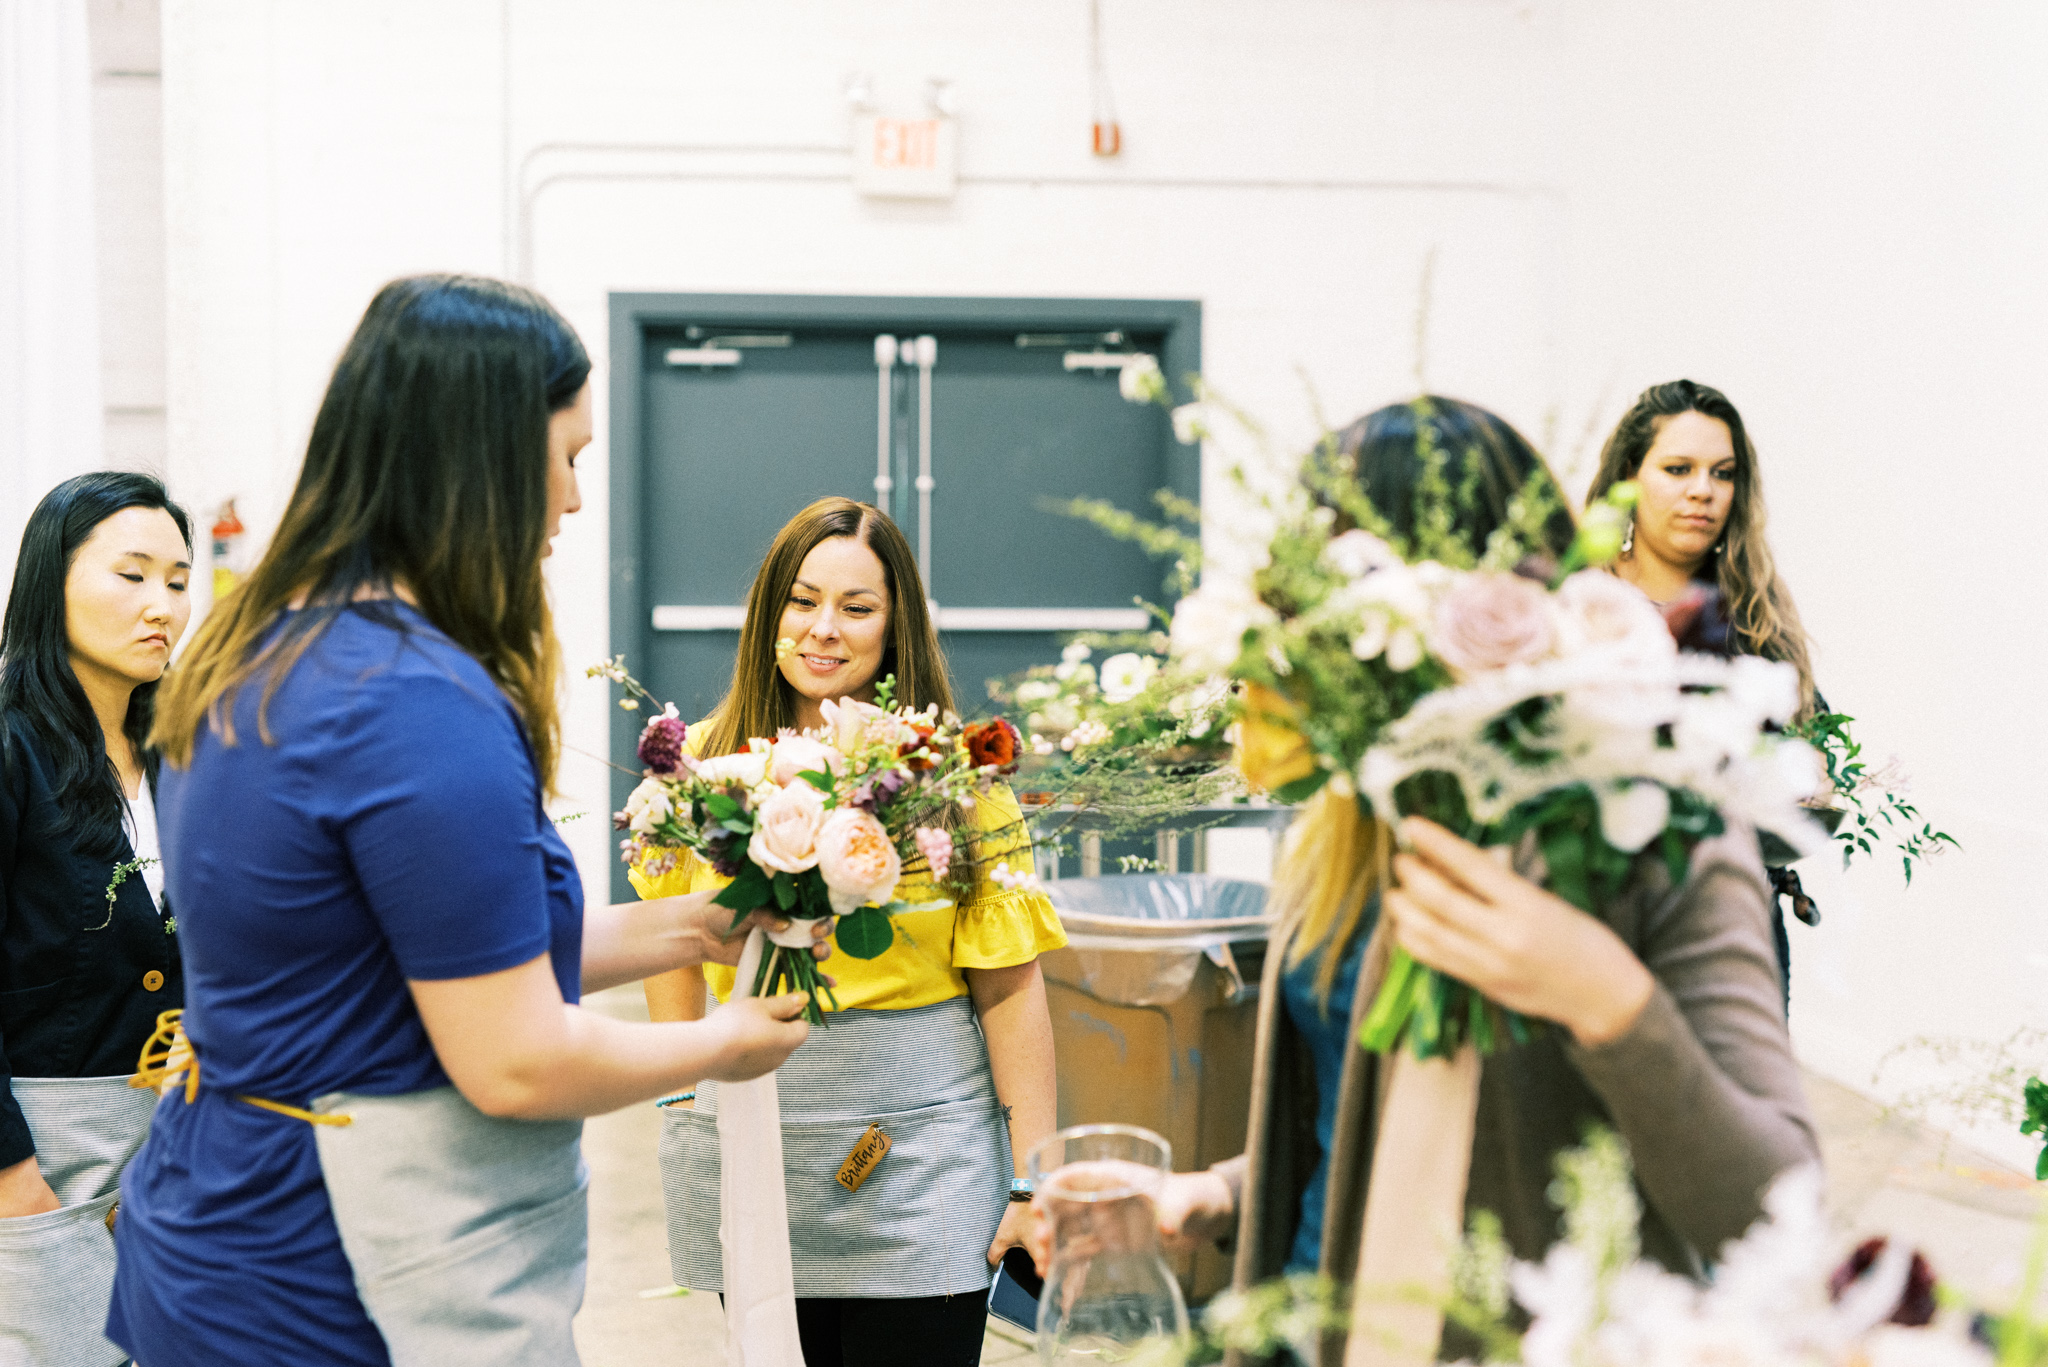 Cultivate Goods Floral Workshop - The Doyle - Kristen Krehbiel - Kristen Kay Photography-45.jpg